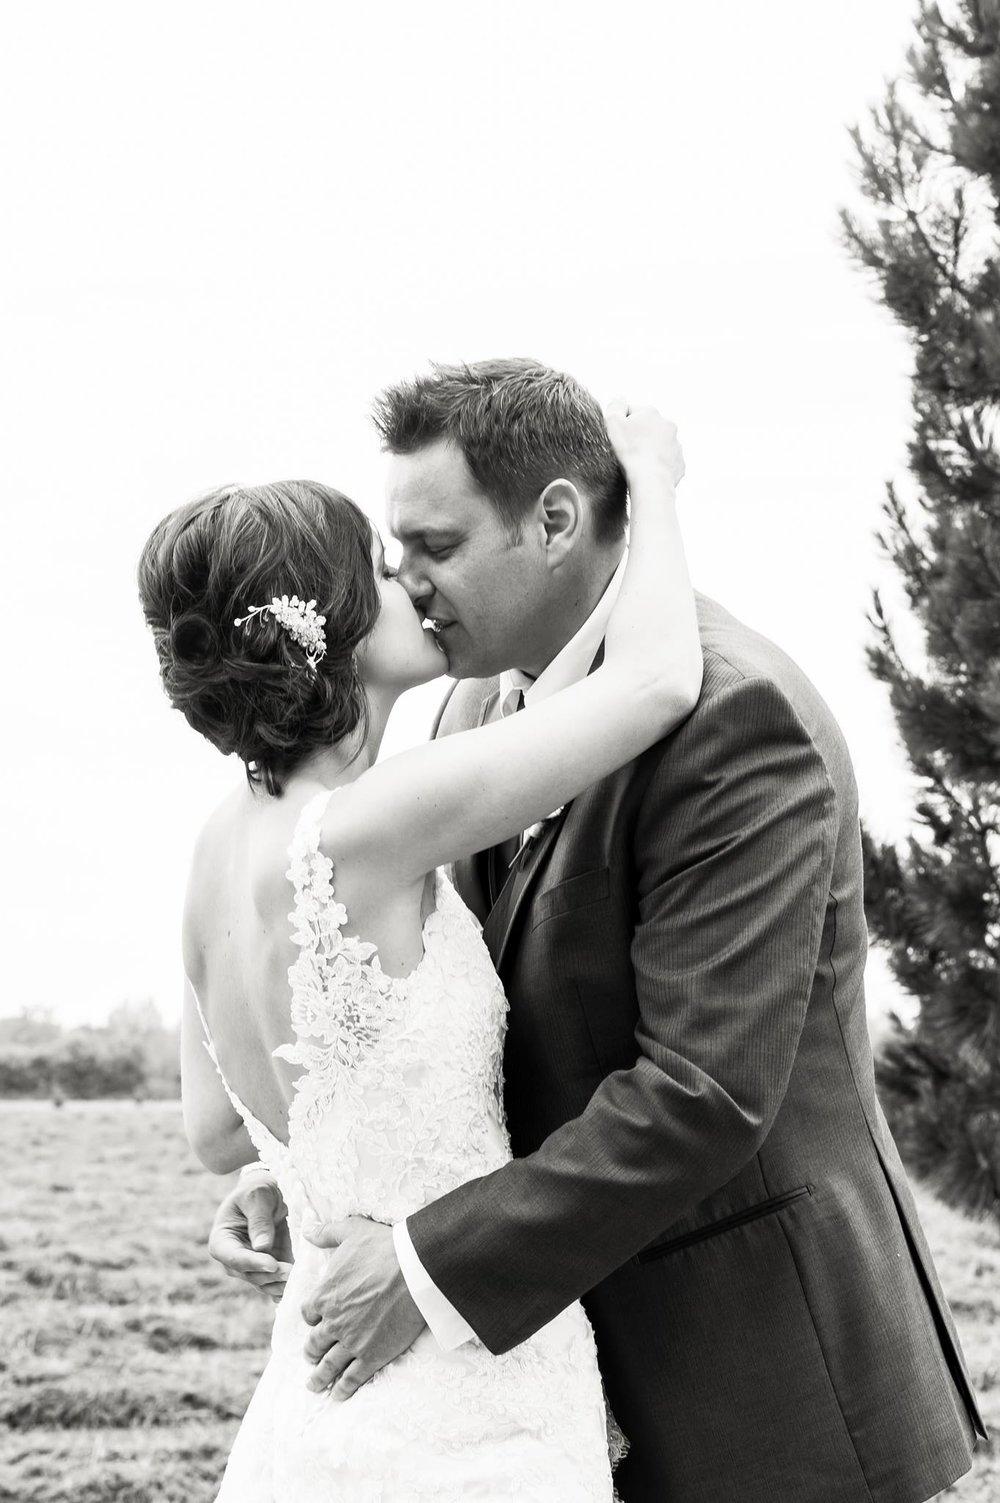 Jamie Scrimgeour - Wedding Picture